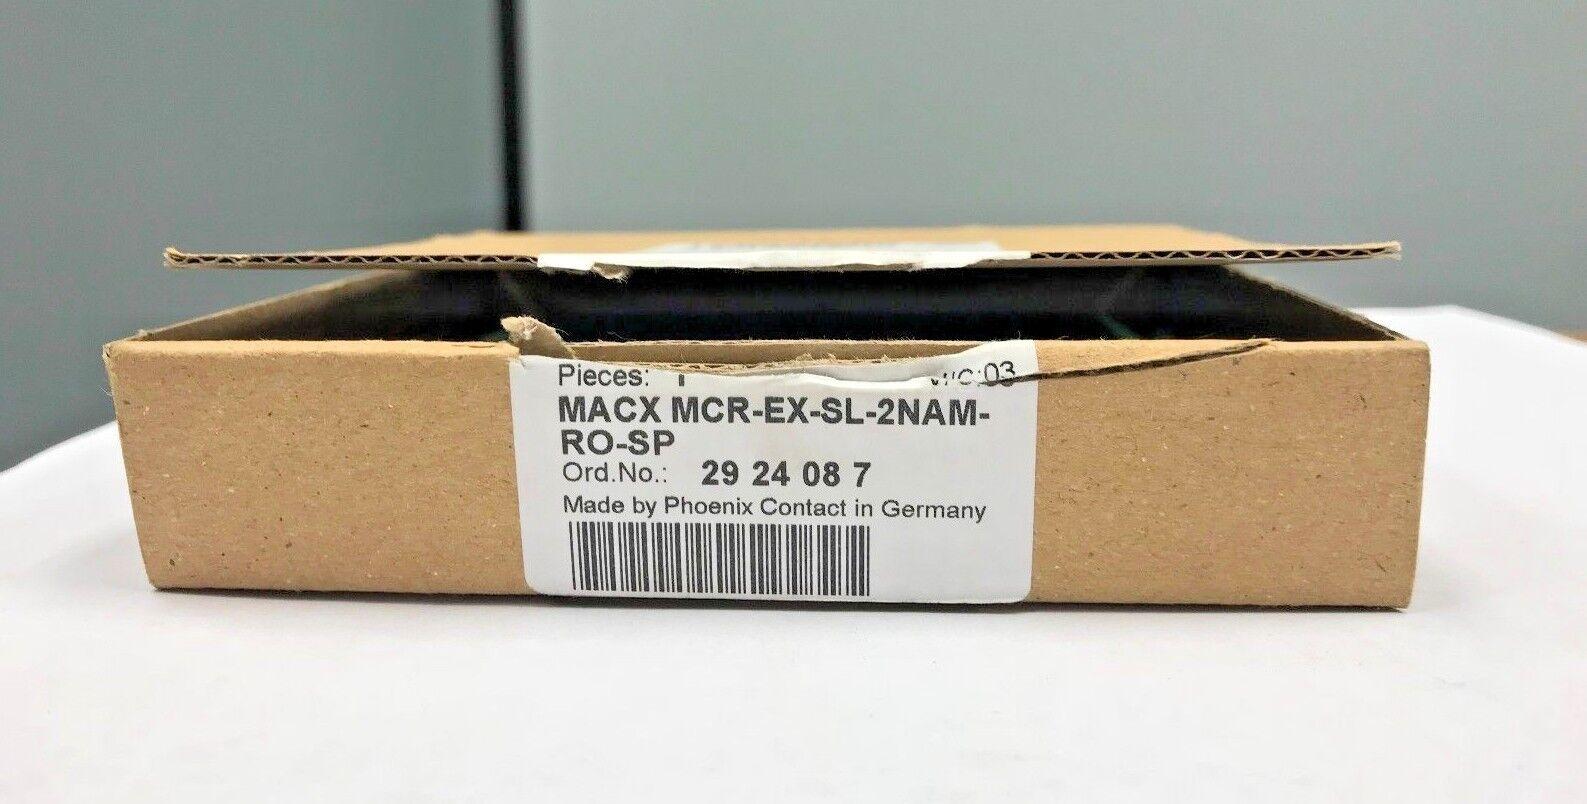 ESD Suppressors//TVS Diodes 1500W 70.0V SMCJ70CA-13-F Pack of 40